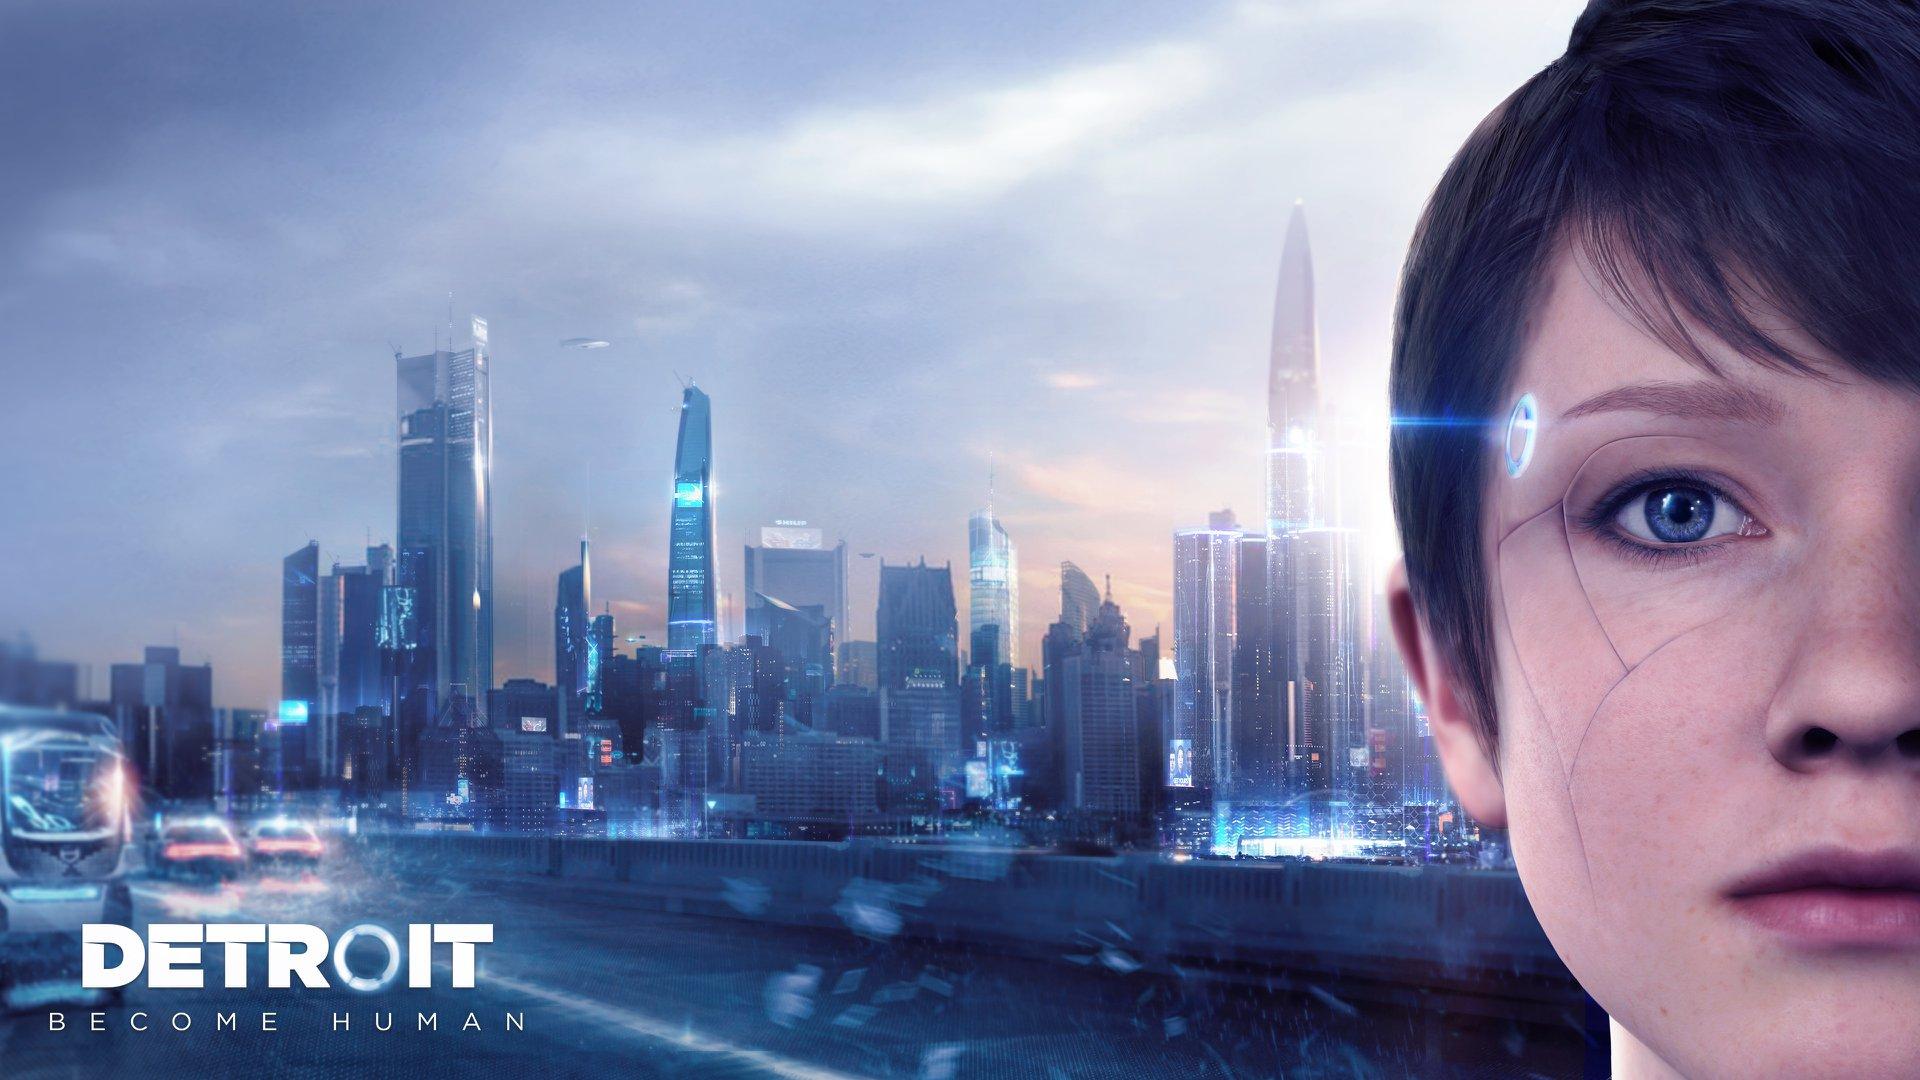 Kara Detroit Become Human Hd Games 4k Wallpapers Images